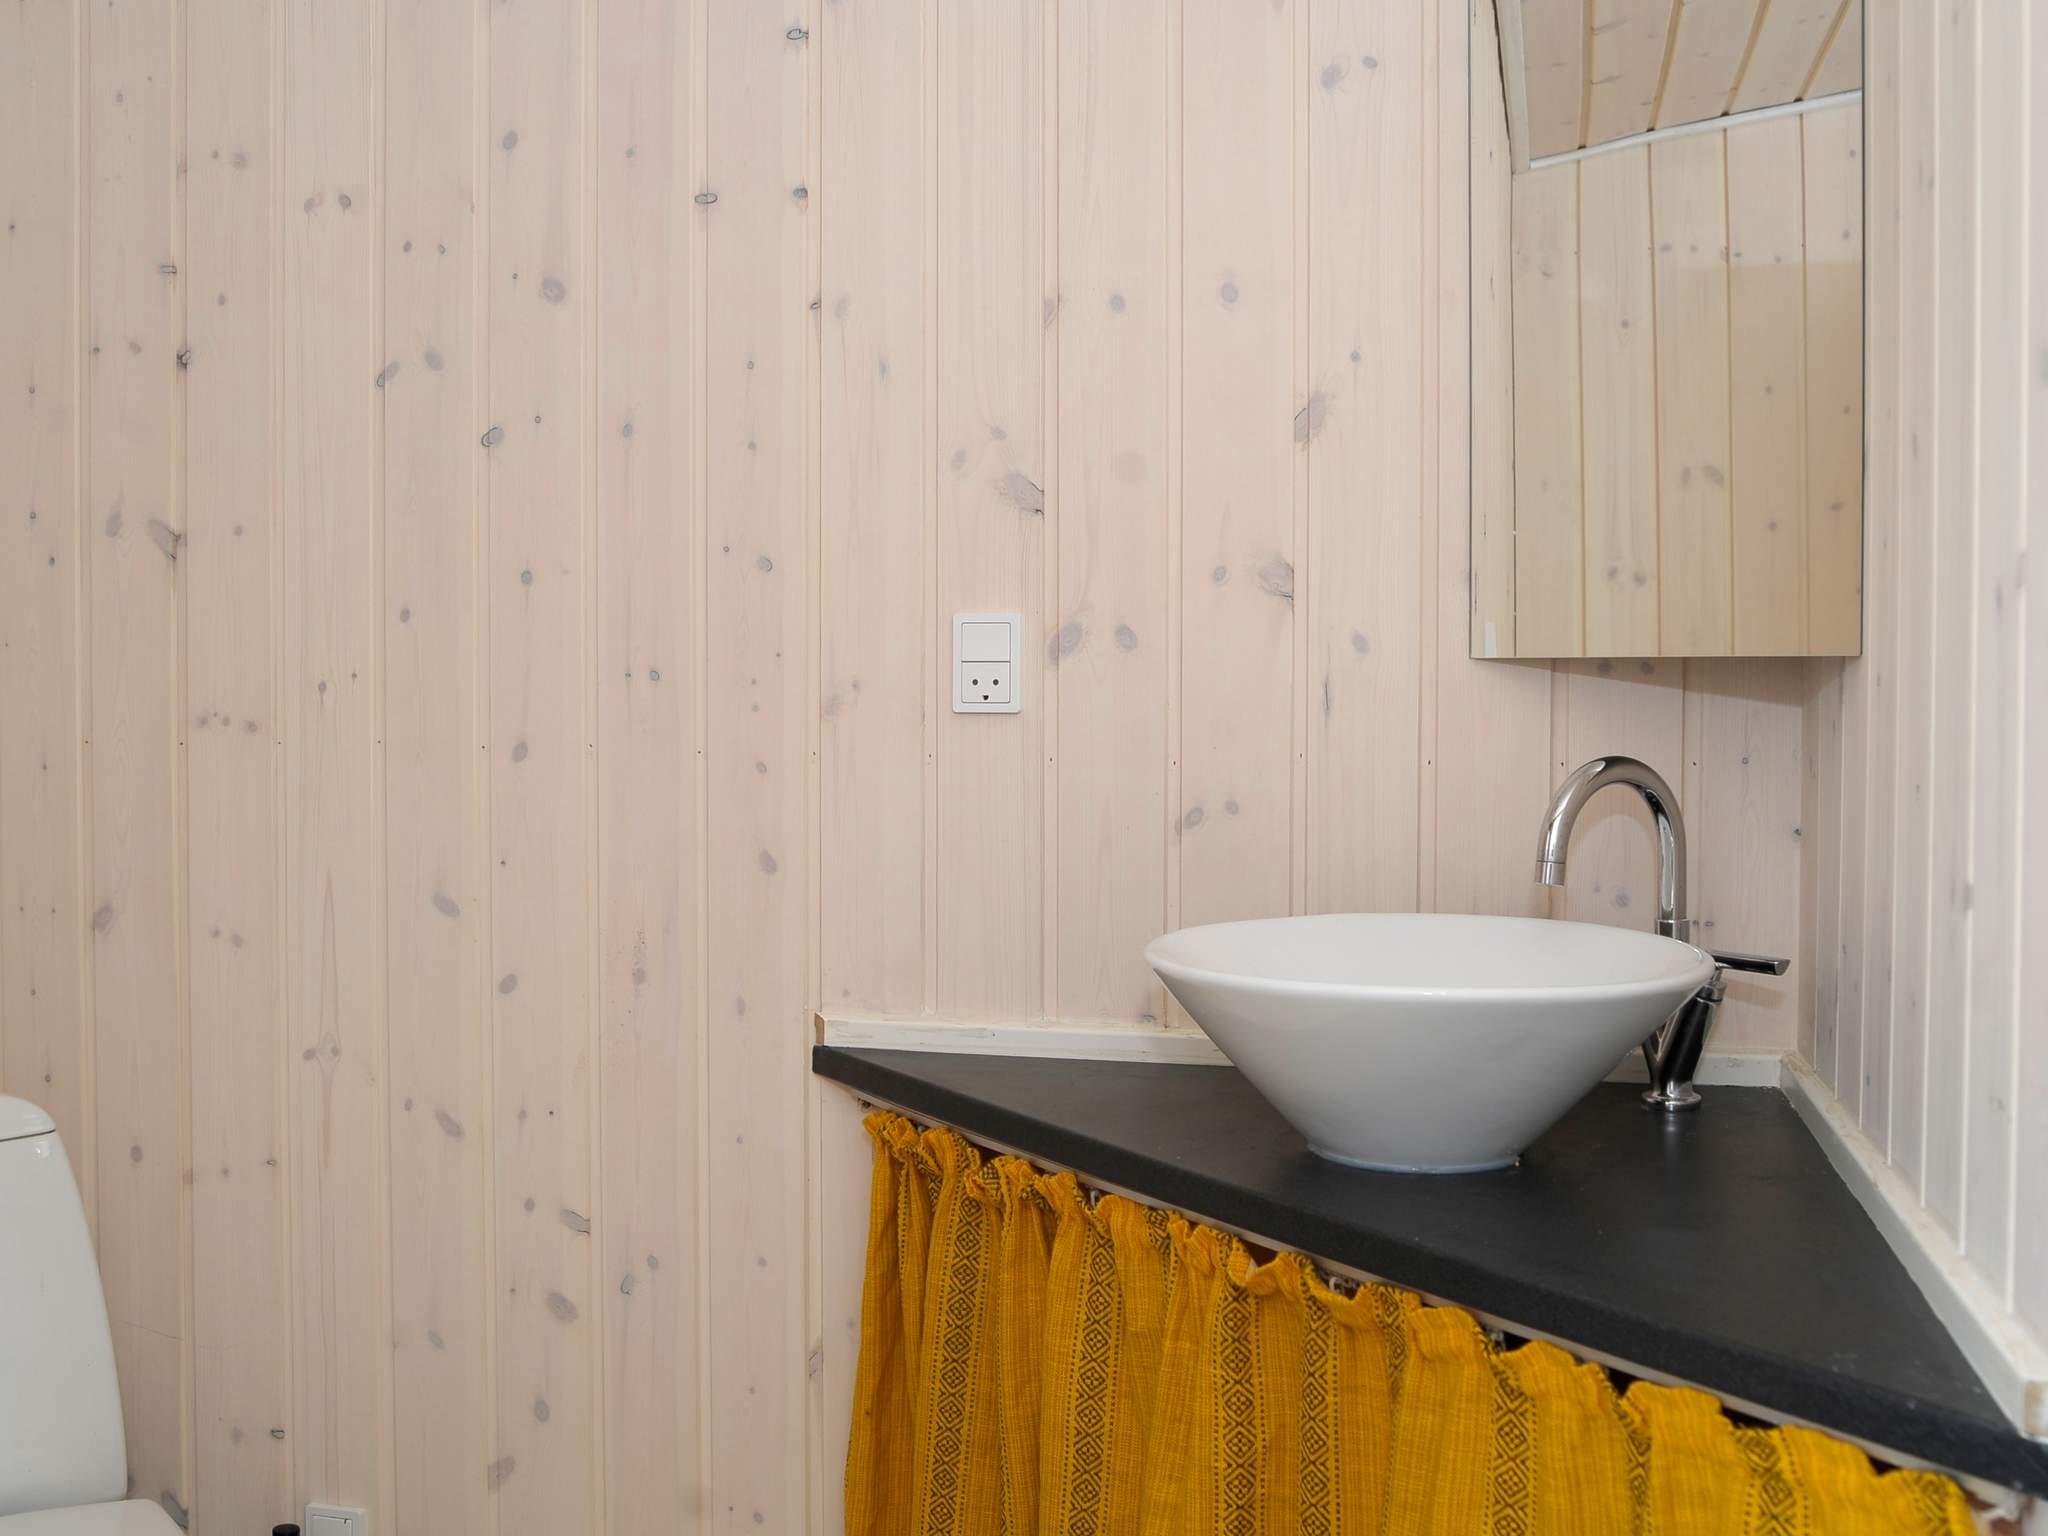 Ferienhaus Dyreborg (440378), Dyreborg, , Fünen, Dänemark, Bild 15